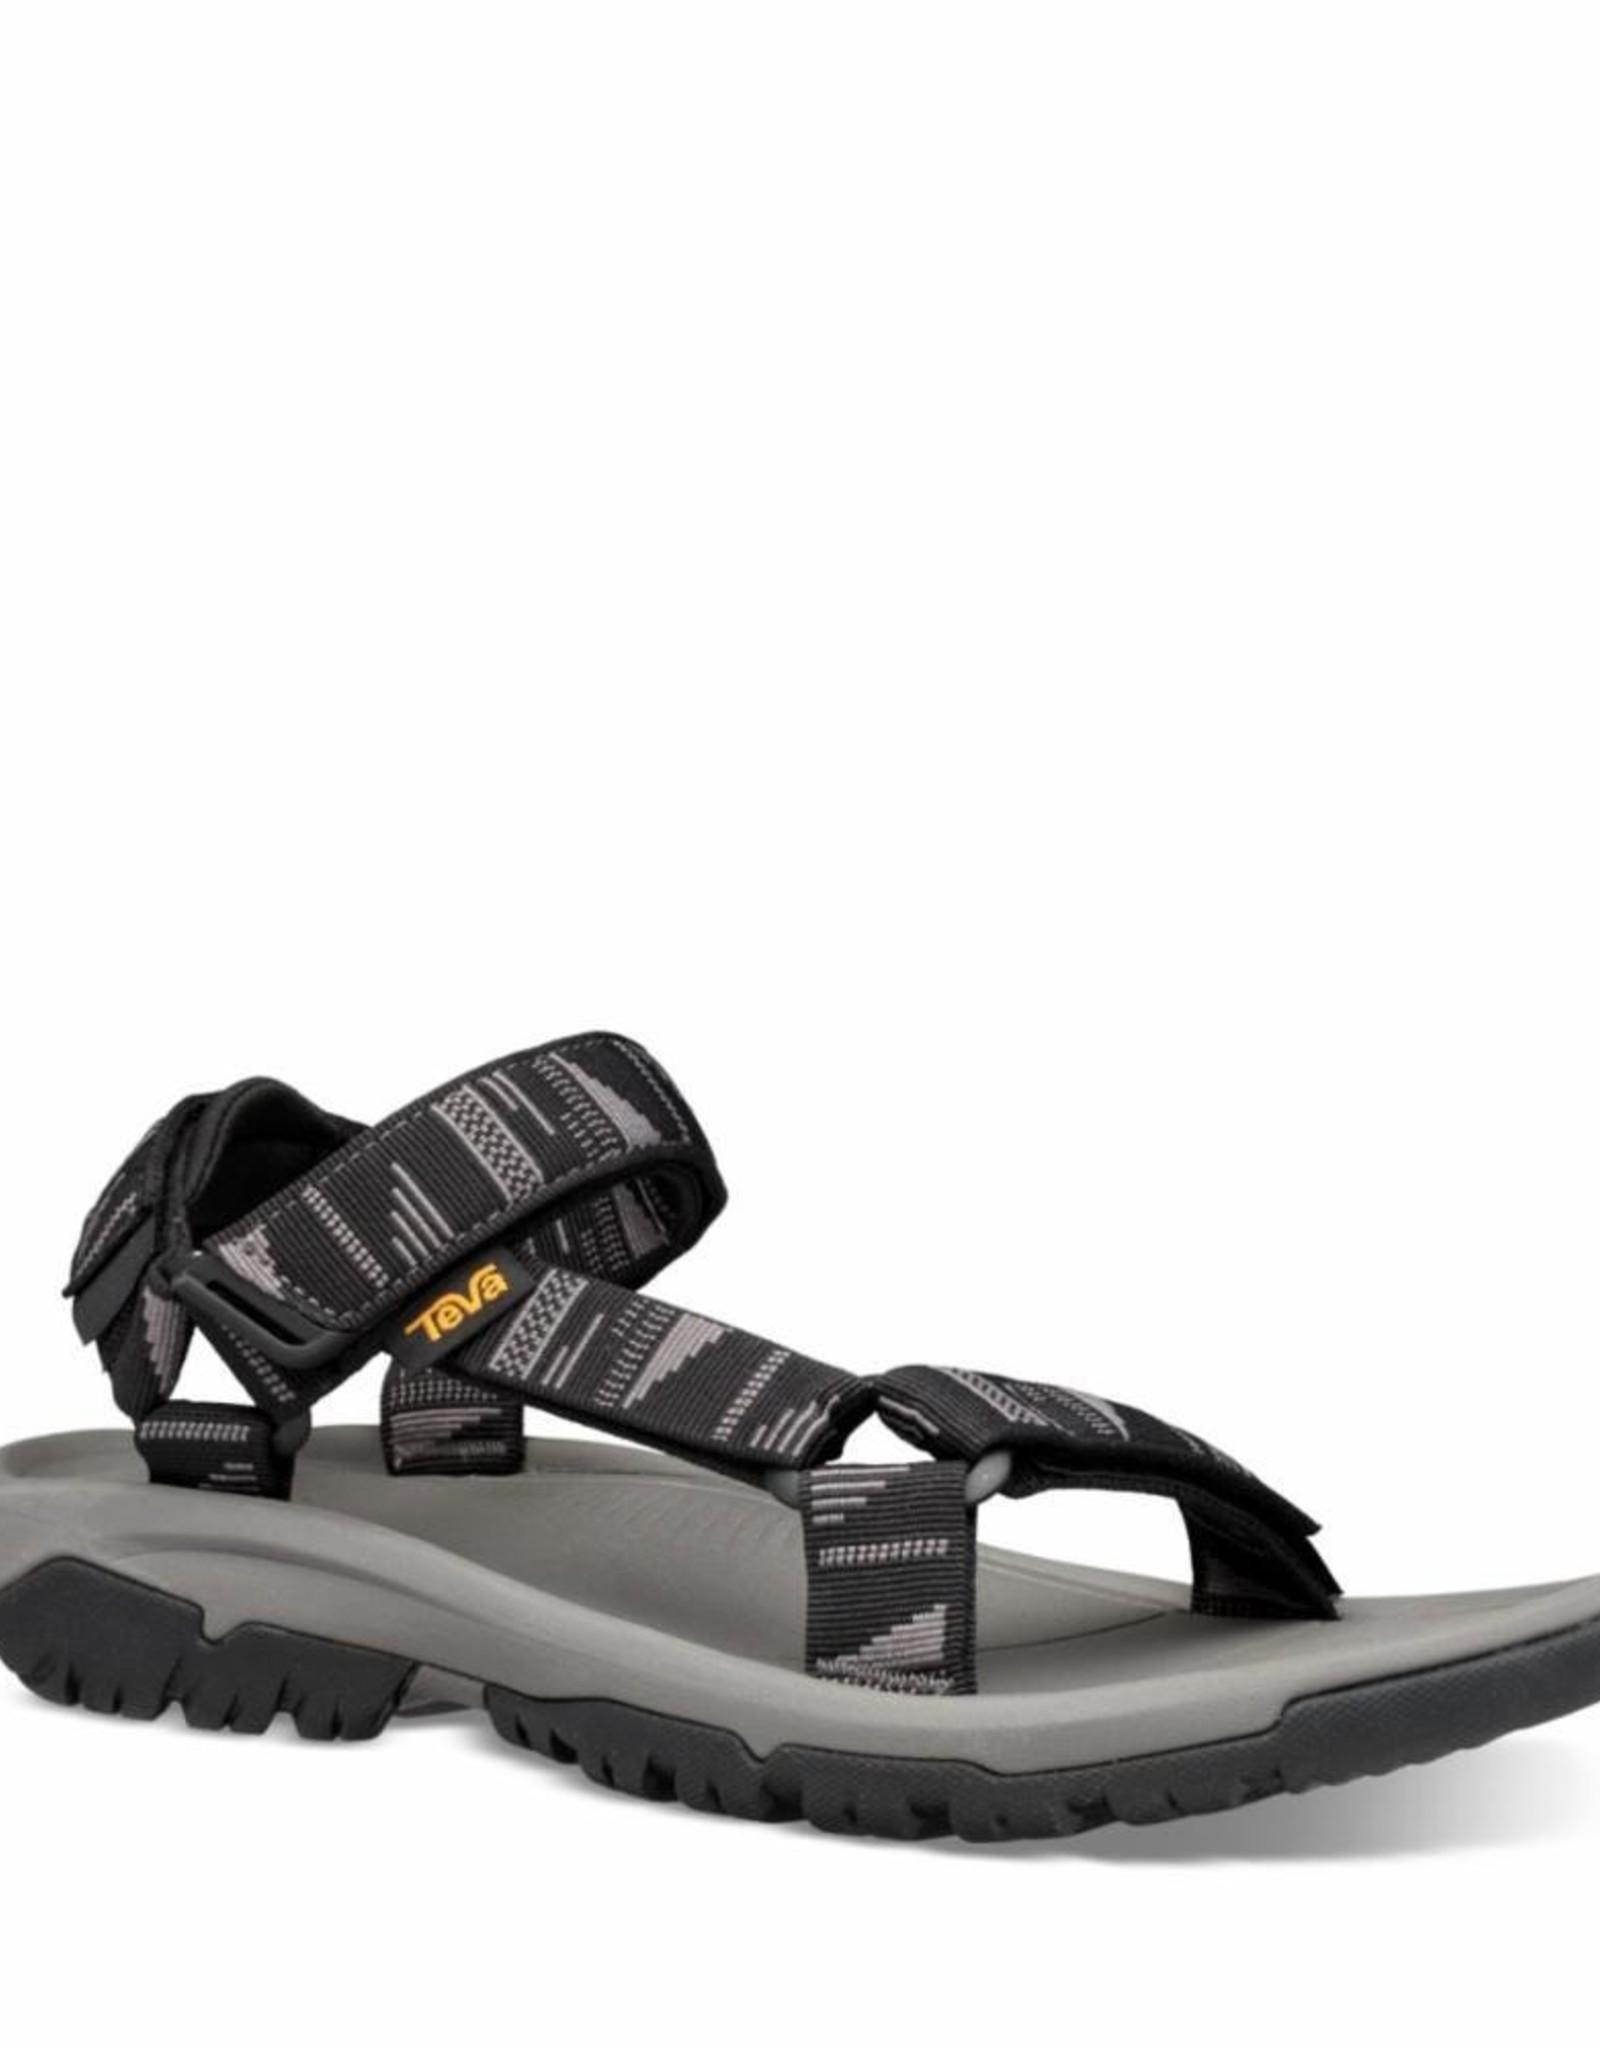 hurricane xlt2 A sandal